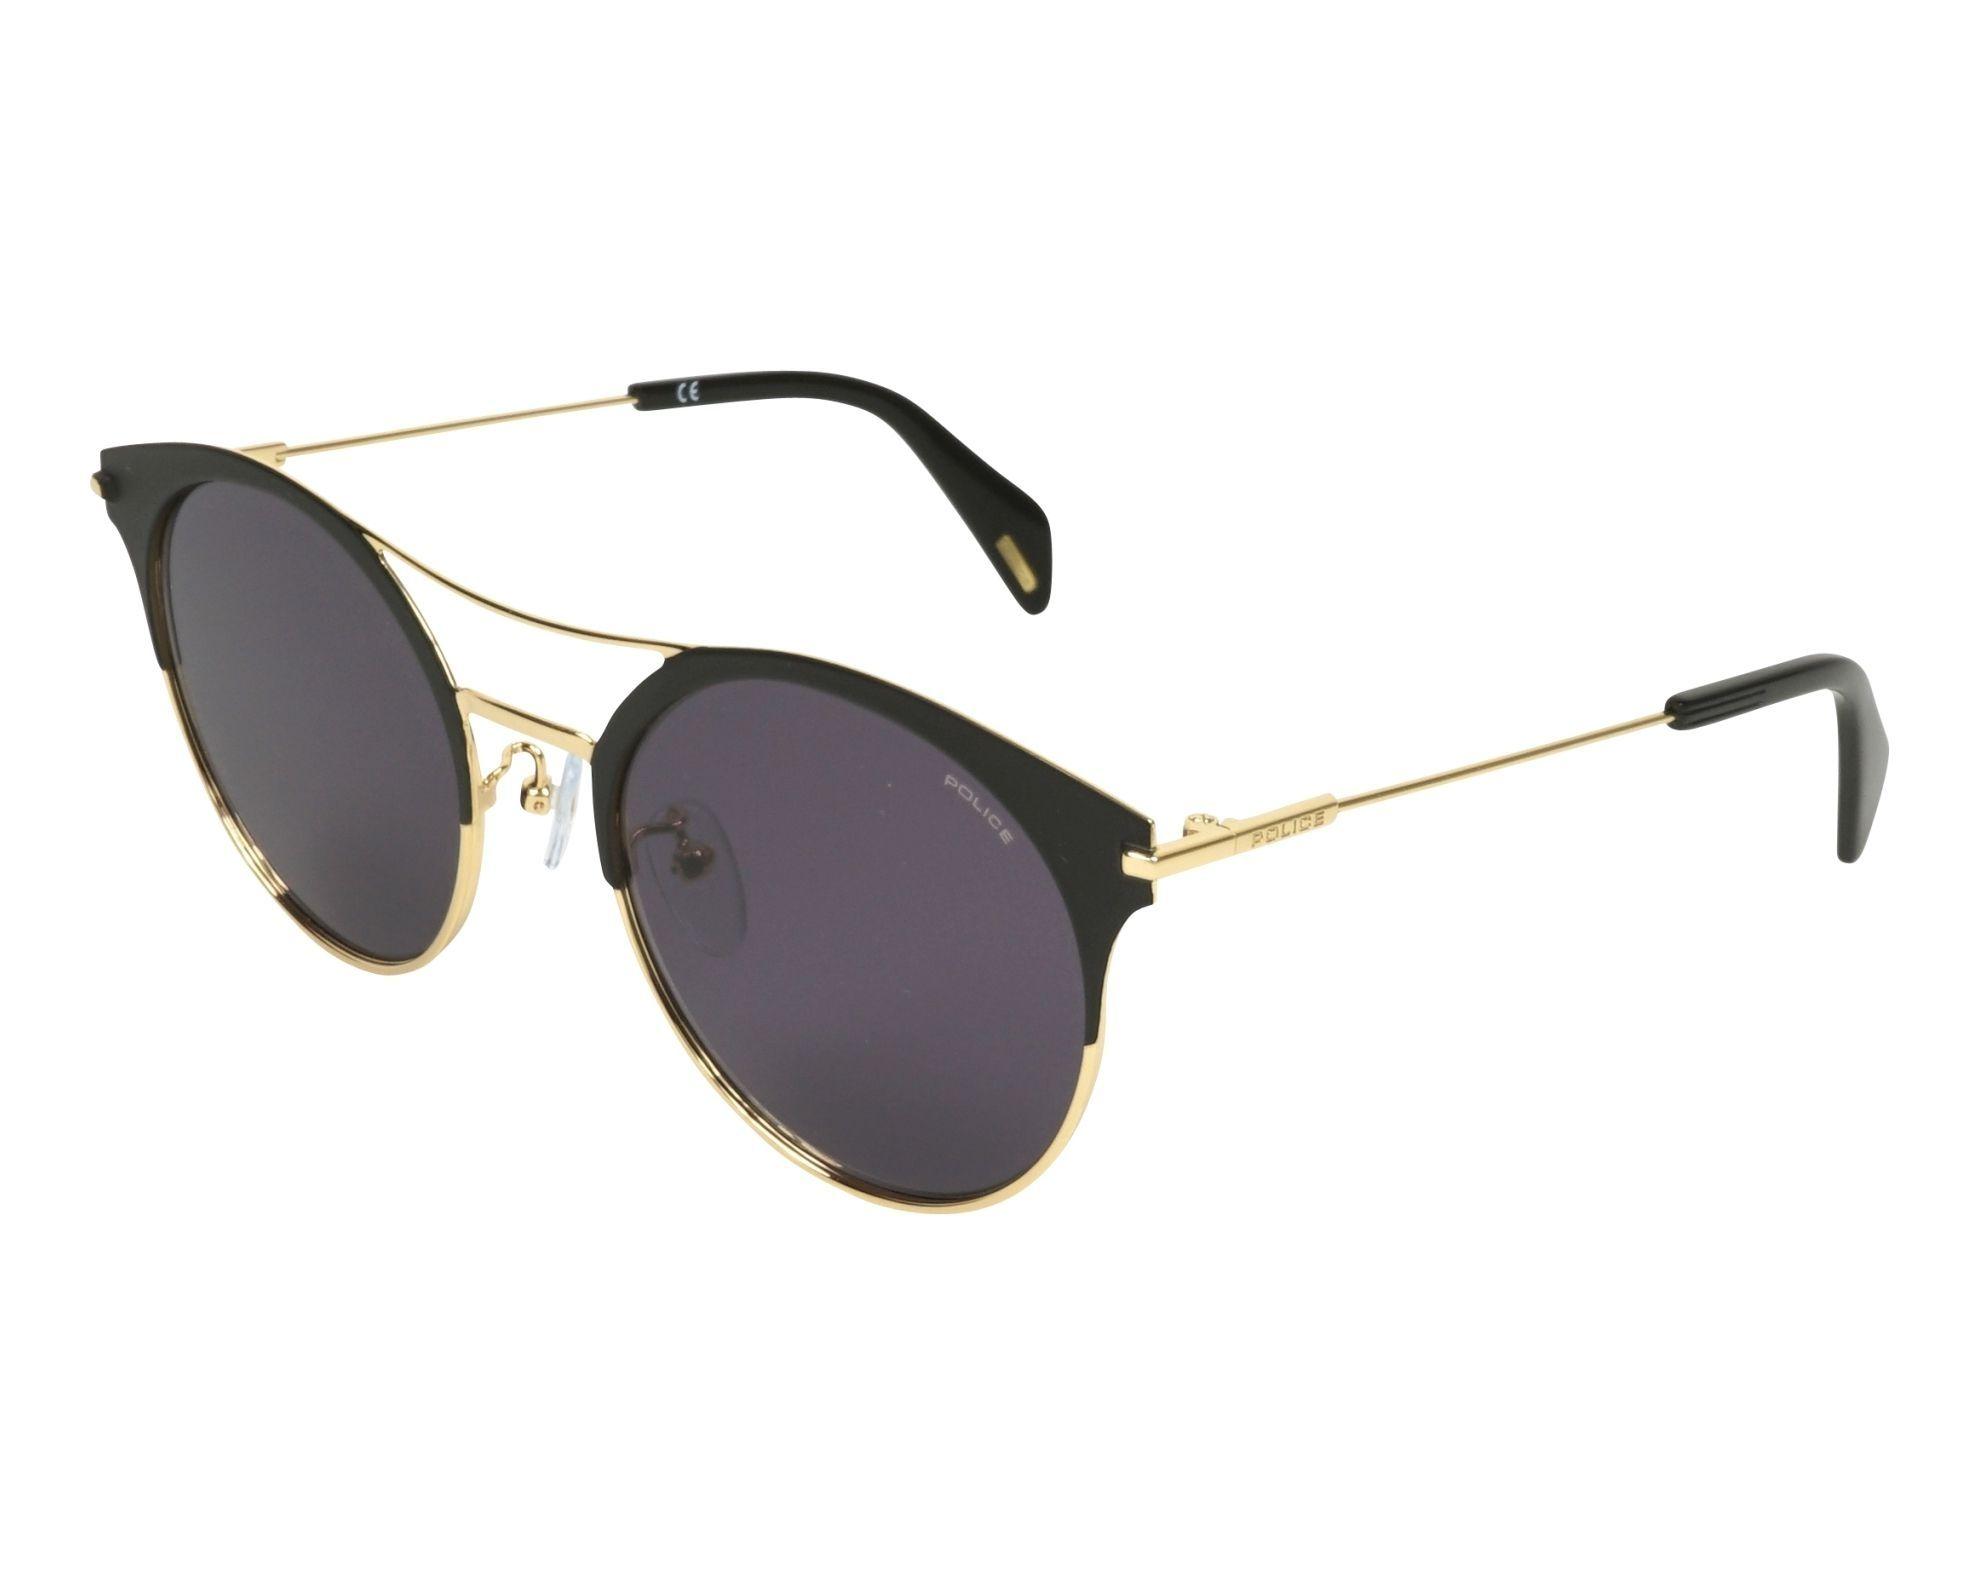 47f5f3dd6 سعر Police Police Sunglasses فى مصر | جوميا | نظارات | كان بكام